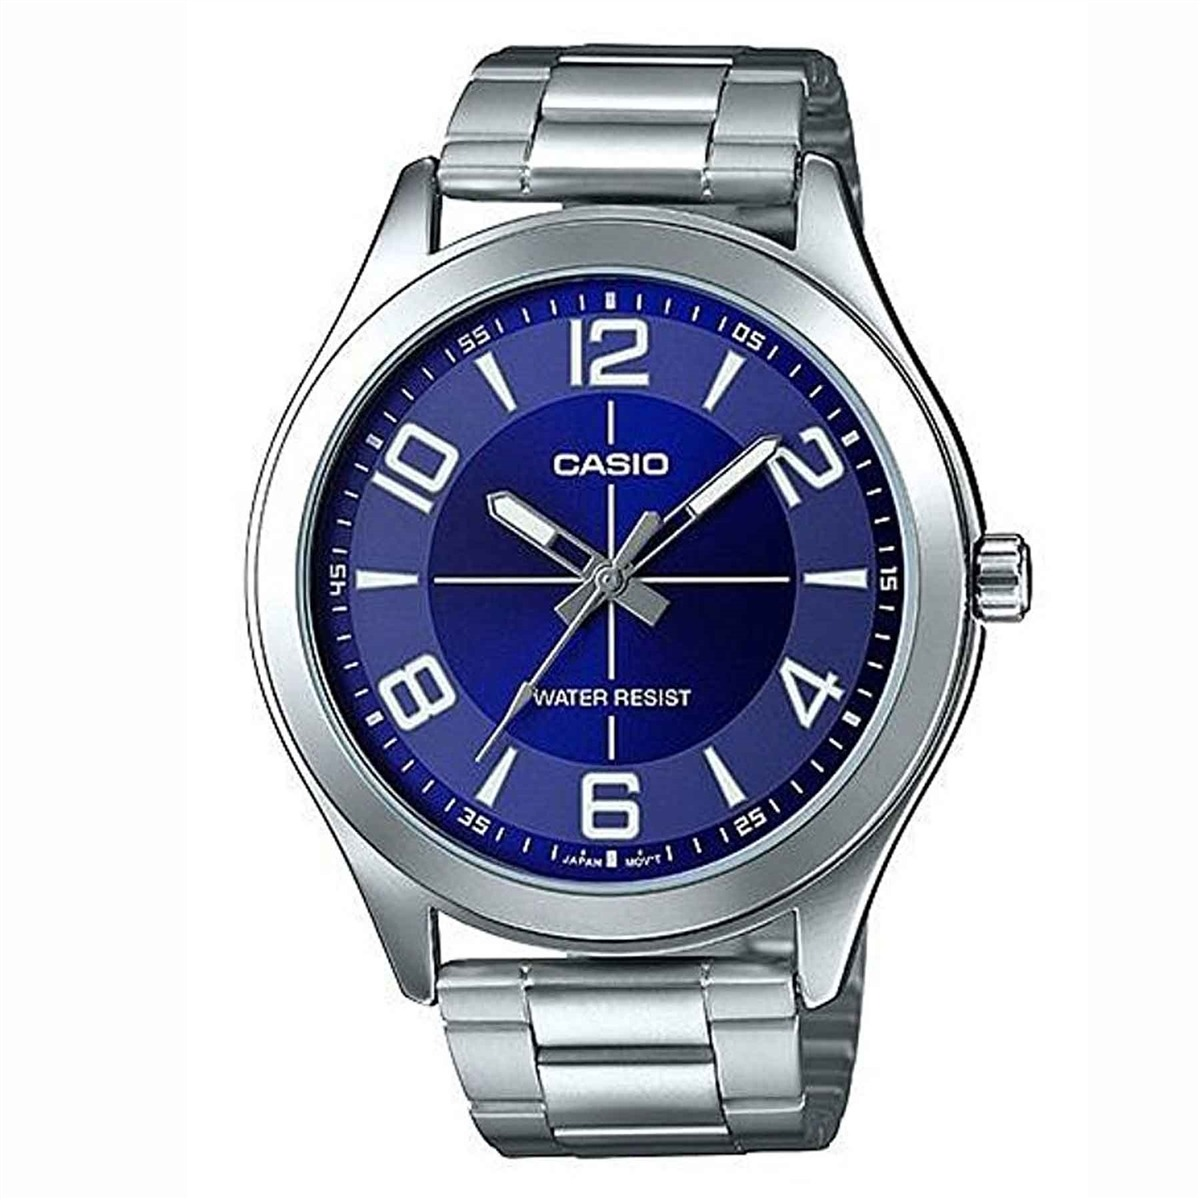 fe552670c72 Relógio Casio Collection Analógico Masculino Mtp-vx01d-2bu - R  175 ...